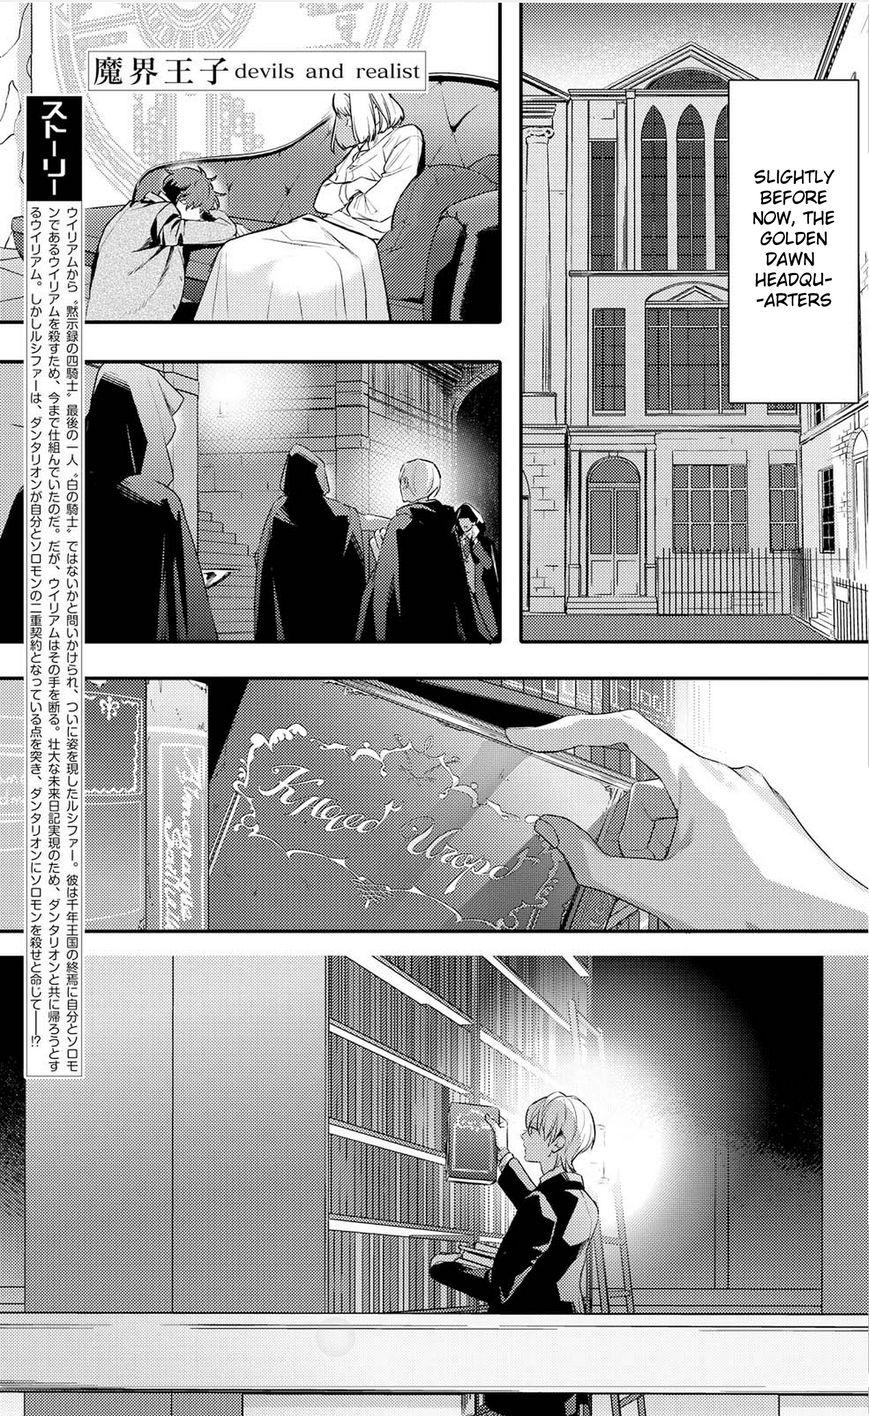 https://img2.nineanime.com/comics/pic9/62/16638/410981/MakaiOujiDevilsandRealist90338.jpg Page 1